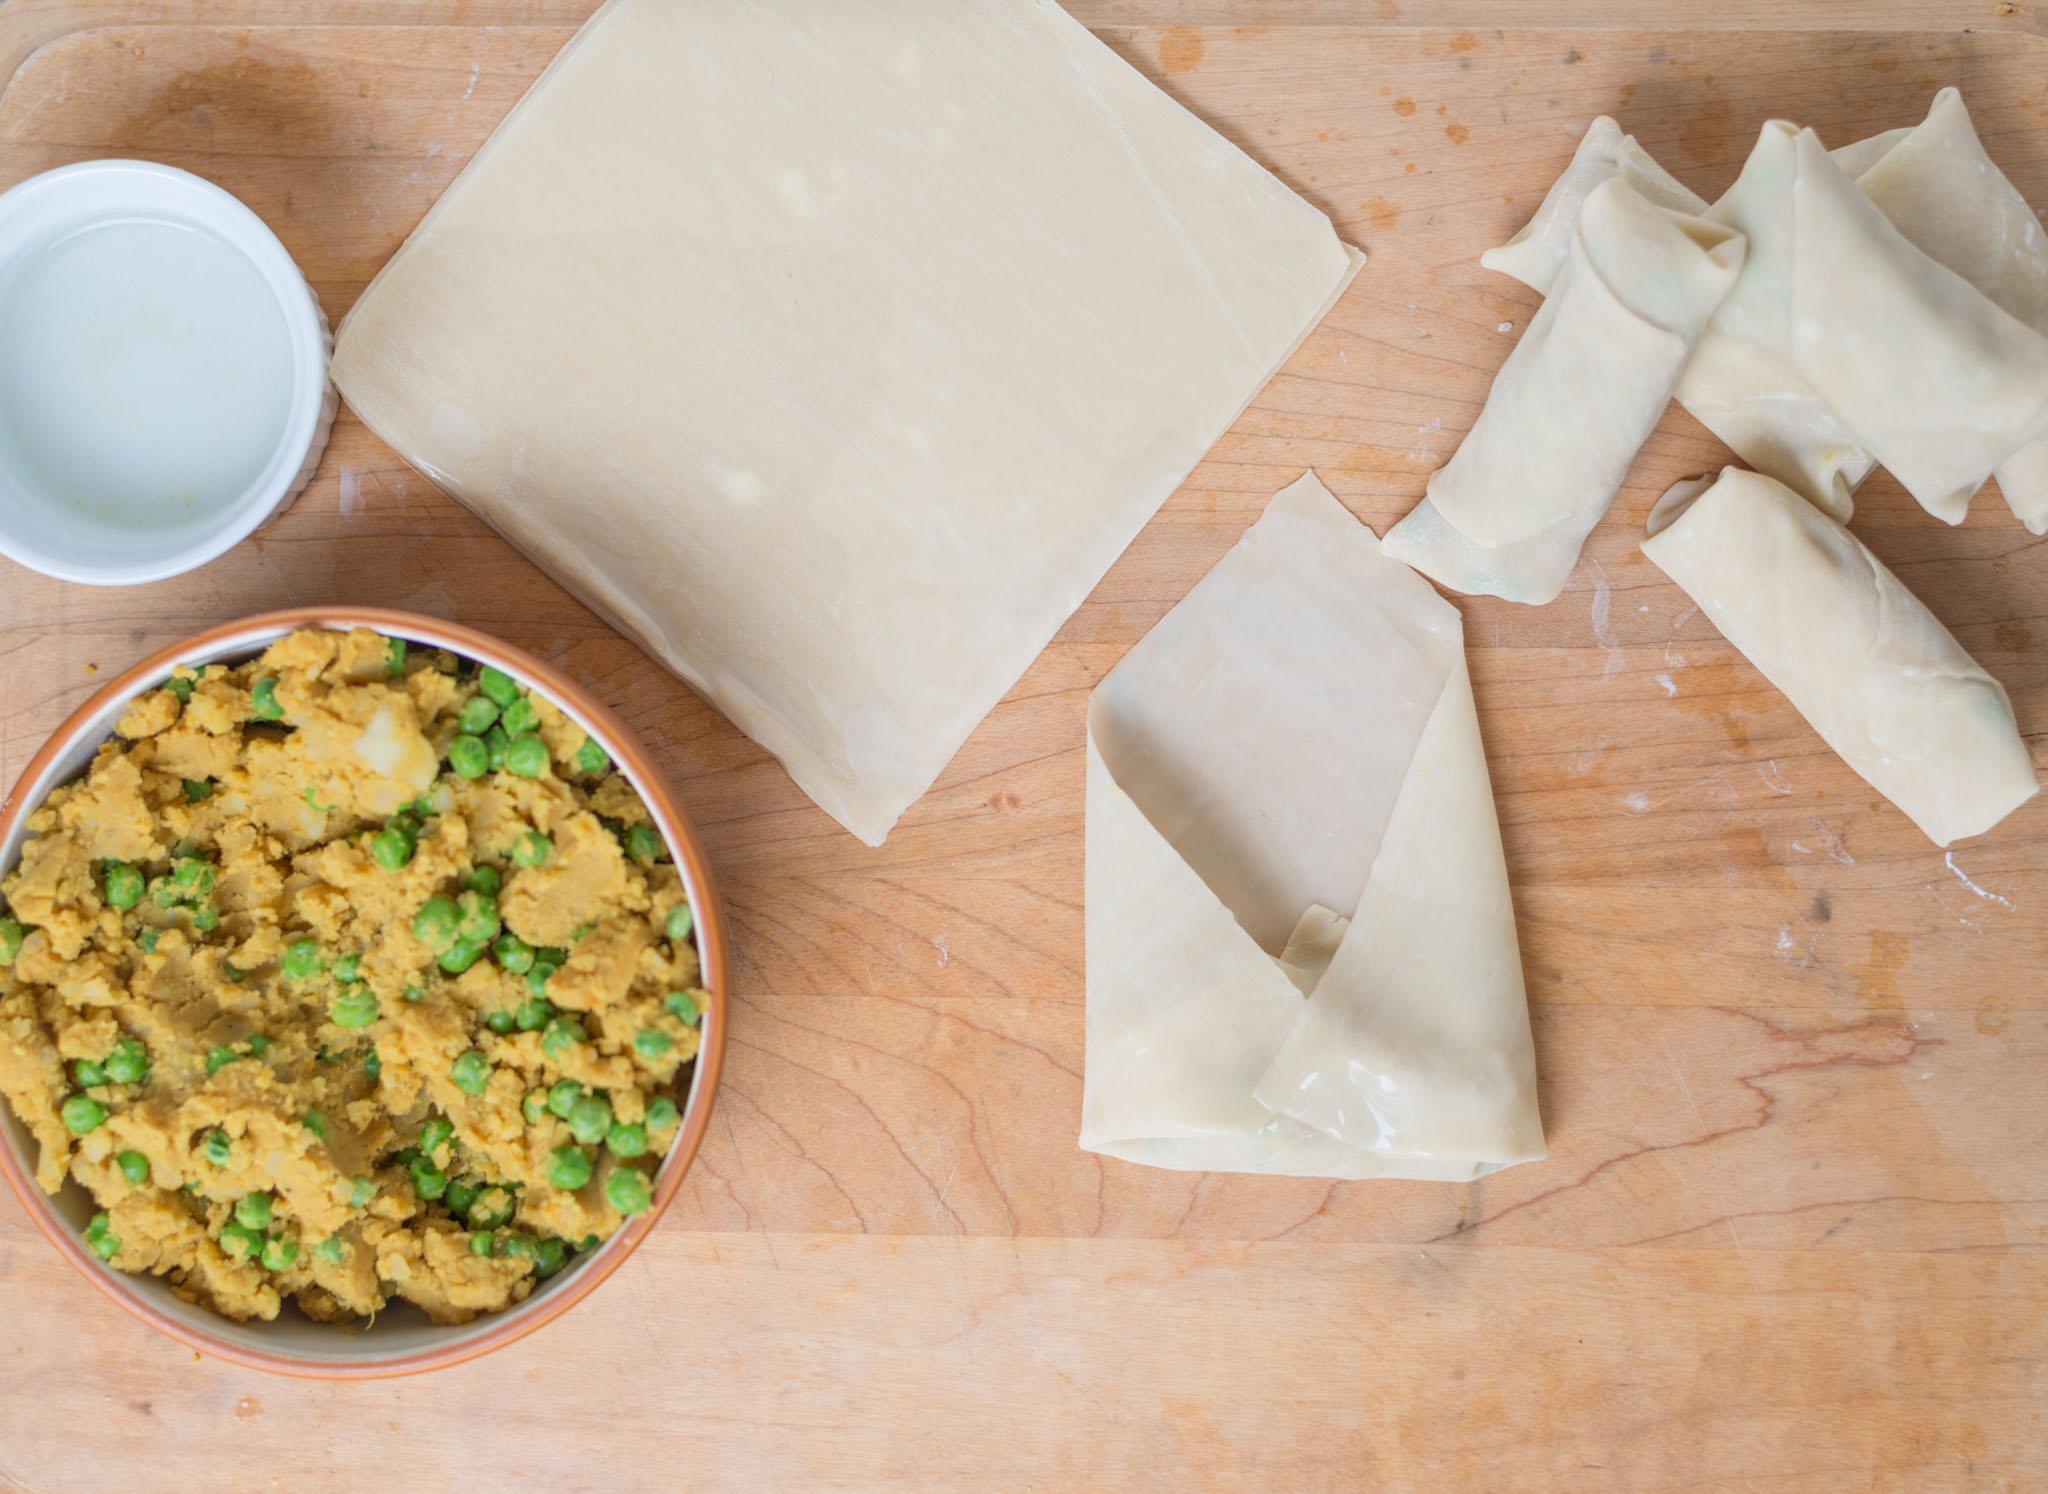 Mixed & Measured |Spiced Potato Pea Egg Rolls